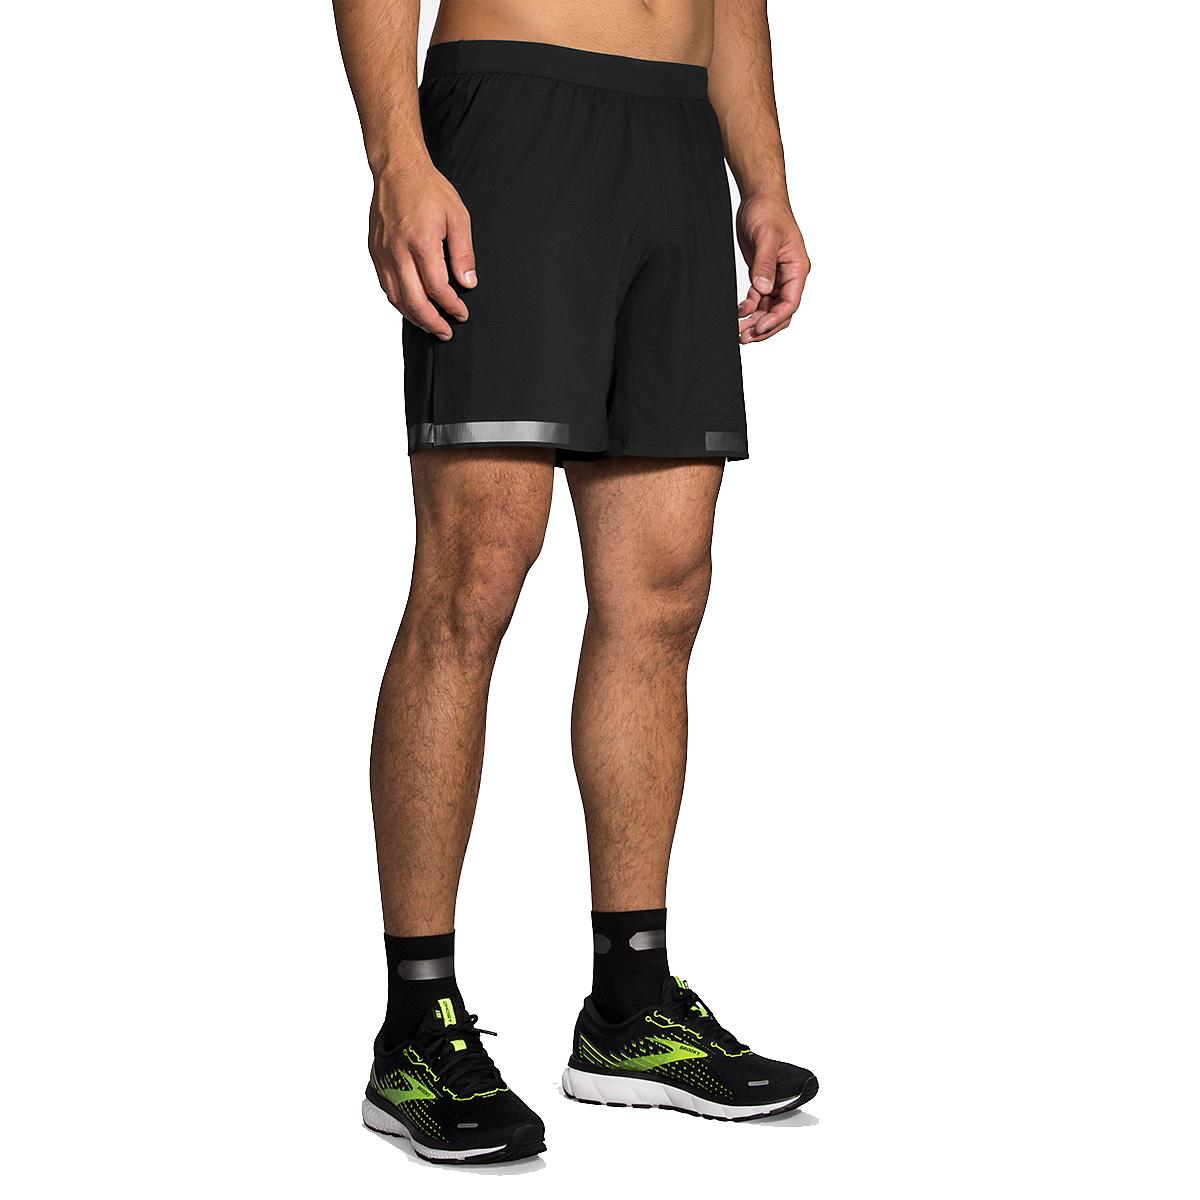 "Men's Brooks Run Visible Carbonite 7"" 2-In-1 Short  - Color: Black - Size: S, Black, large, image 1"